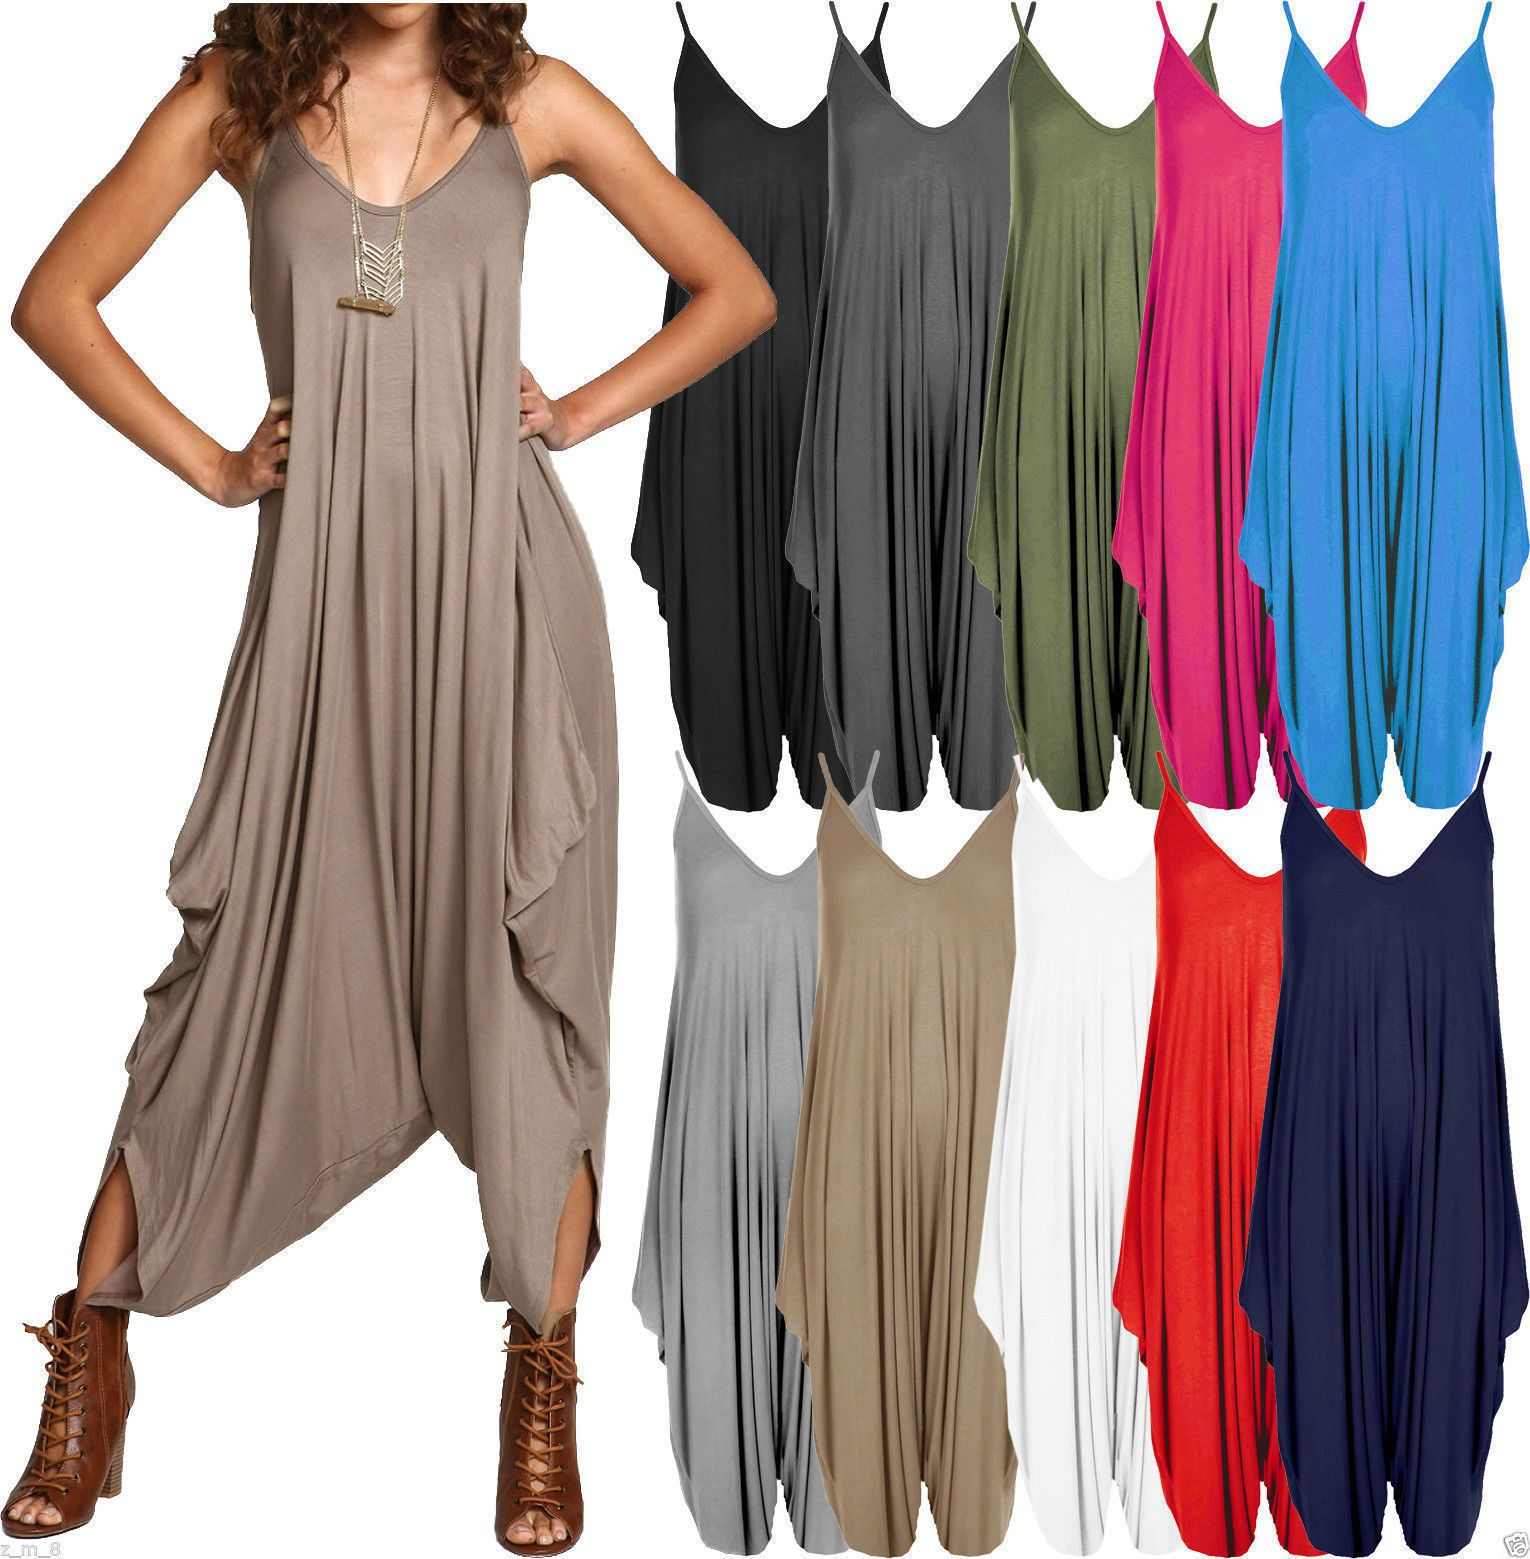 Women/'s Ladies Cami Strappy Lagenlook Baggy Harem Jumpsuit Playsuit Top Dress